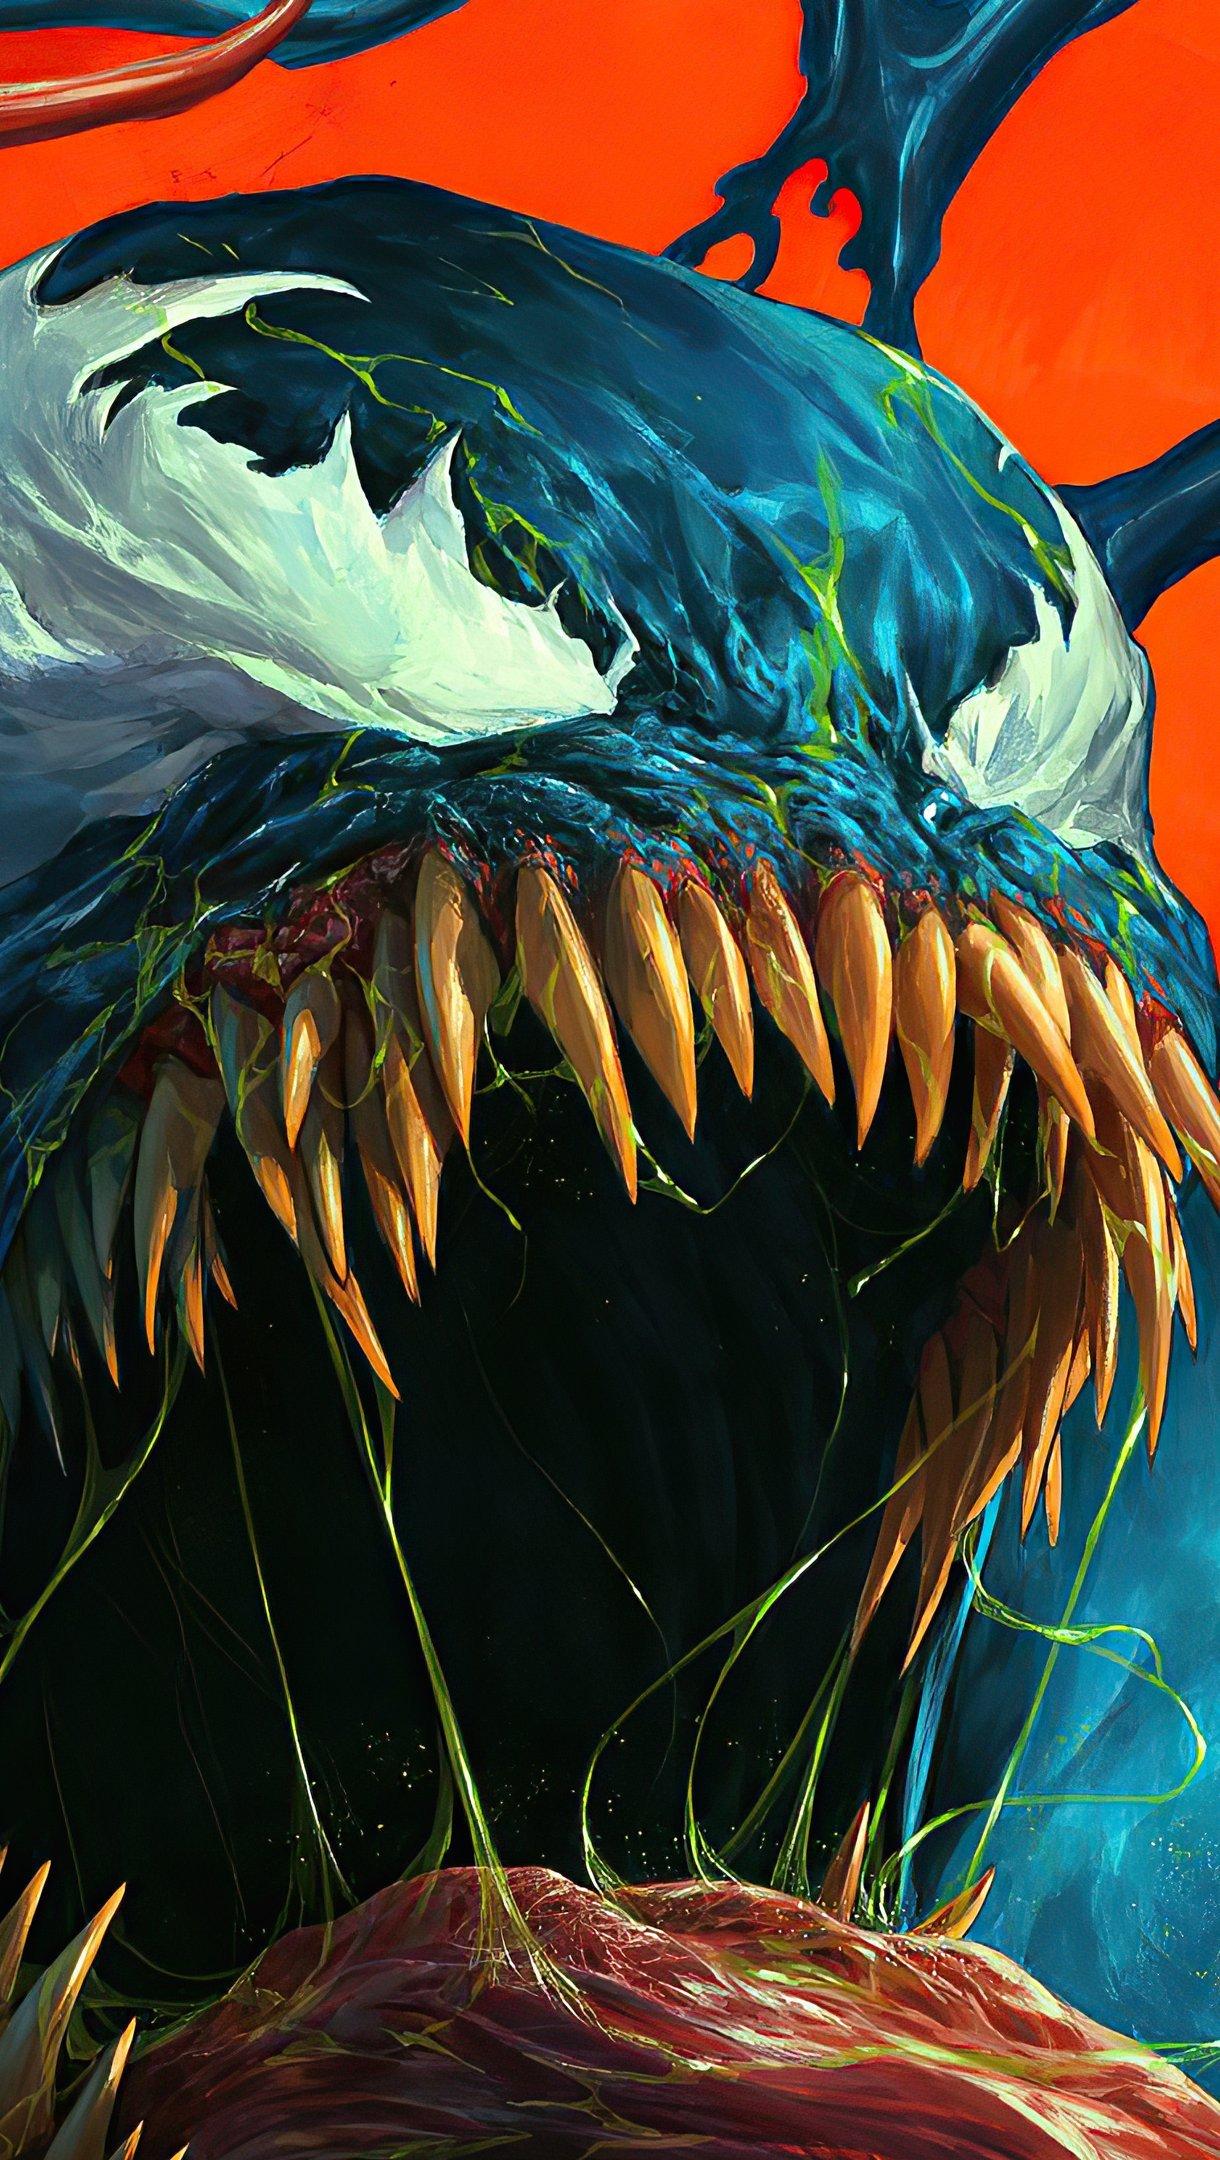 Wallpaper Venom Artwork 2020 Vertical